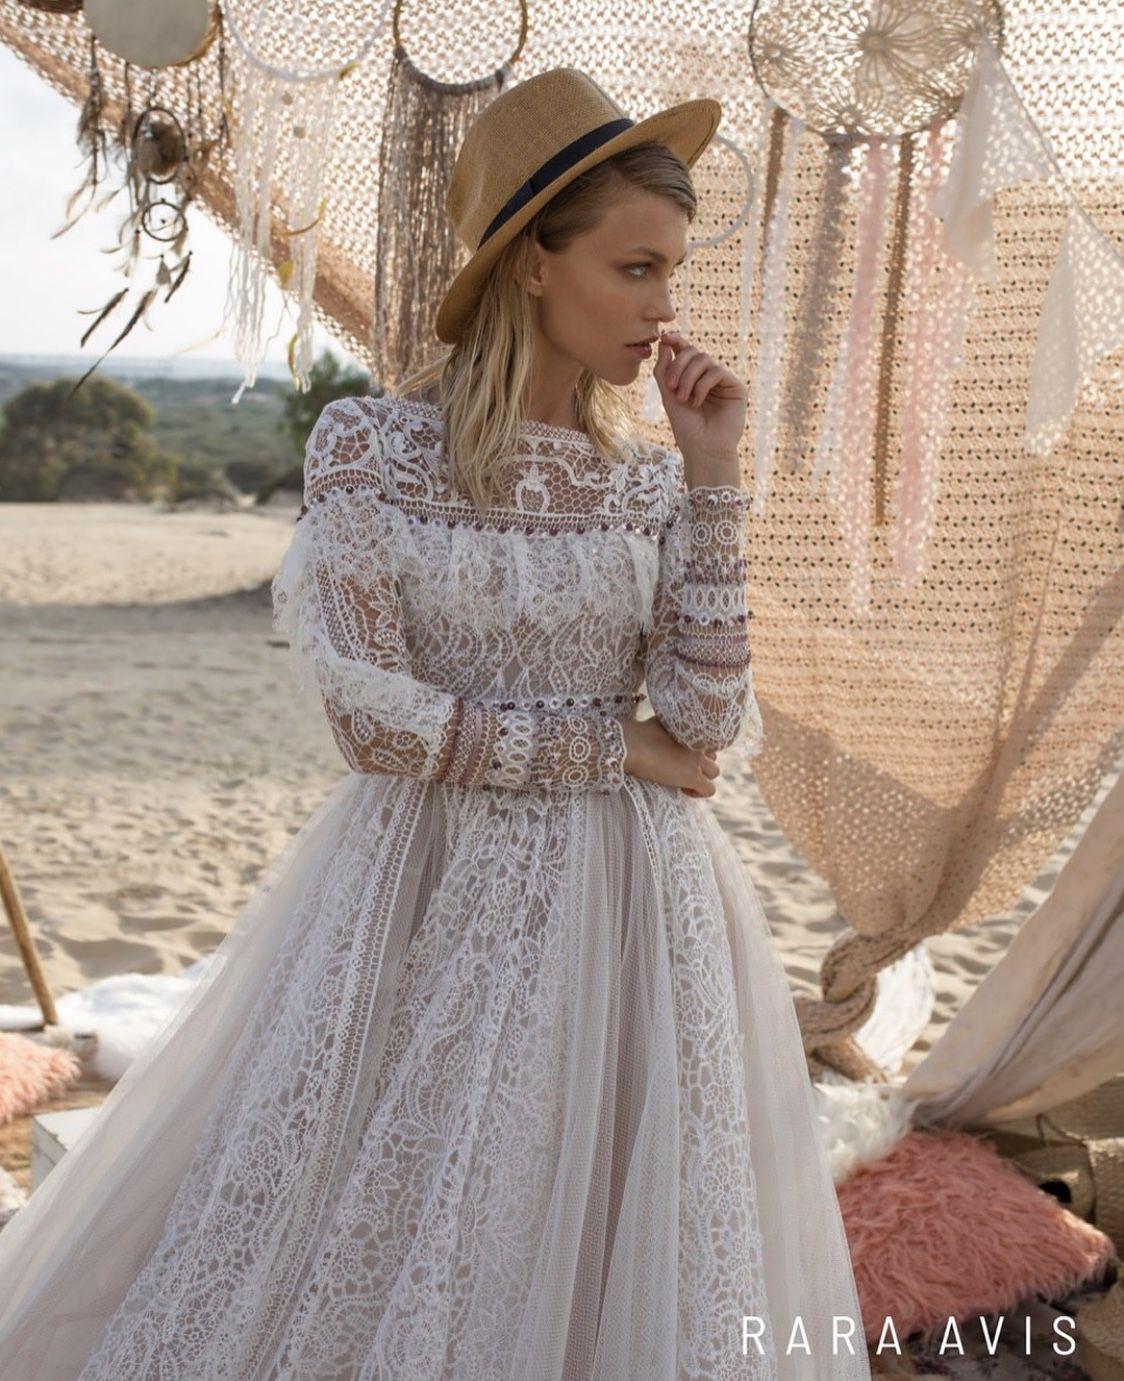 Pin by jason mj on bridal gown pinterest boho wedding dress